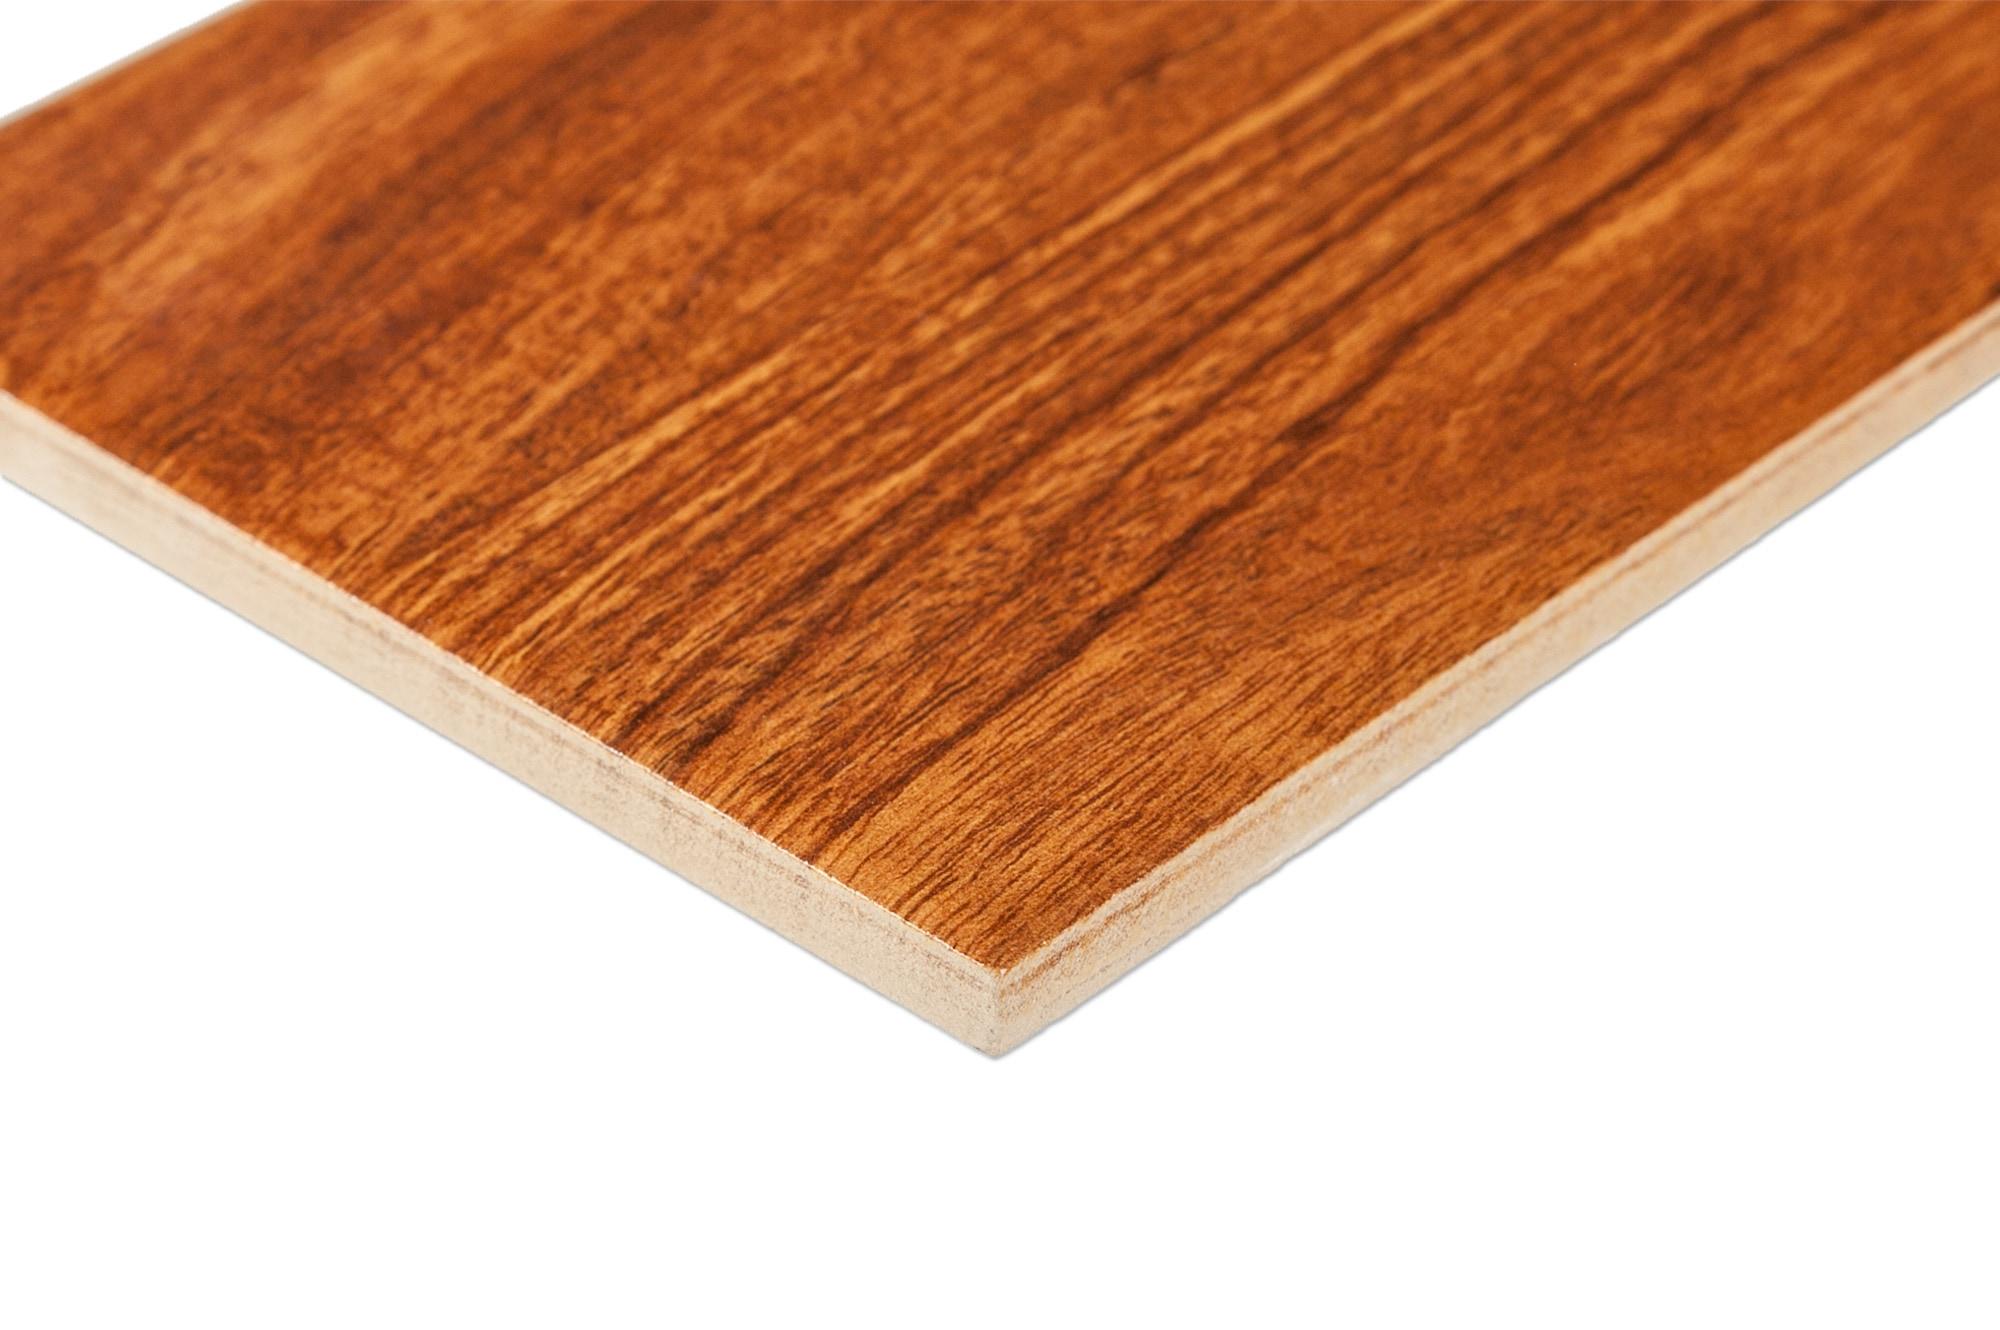 Free samples salerno ceramic tile american wood series copper free samples salerno ceramic tile american wood series copper oak 6x24 dailygadgetfo Choice Image